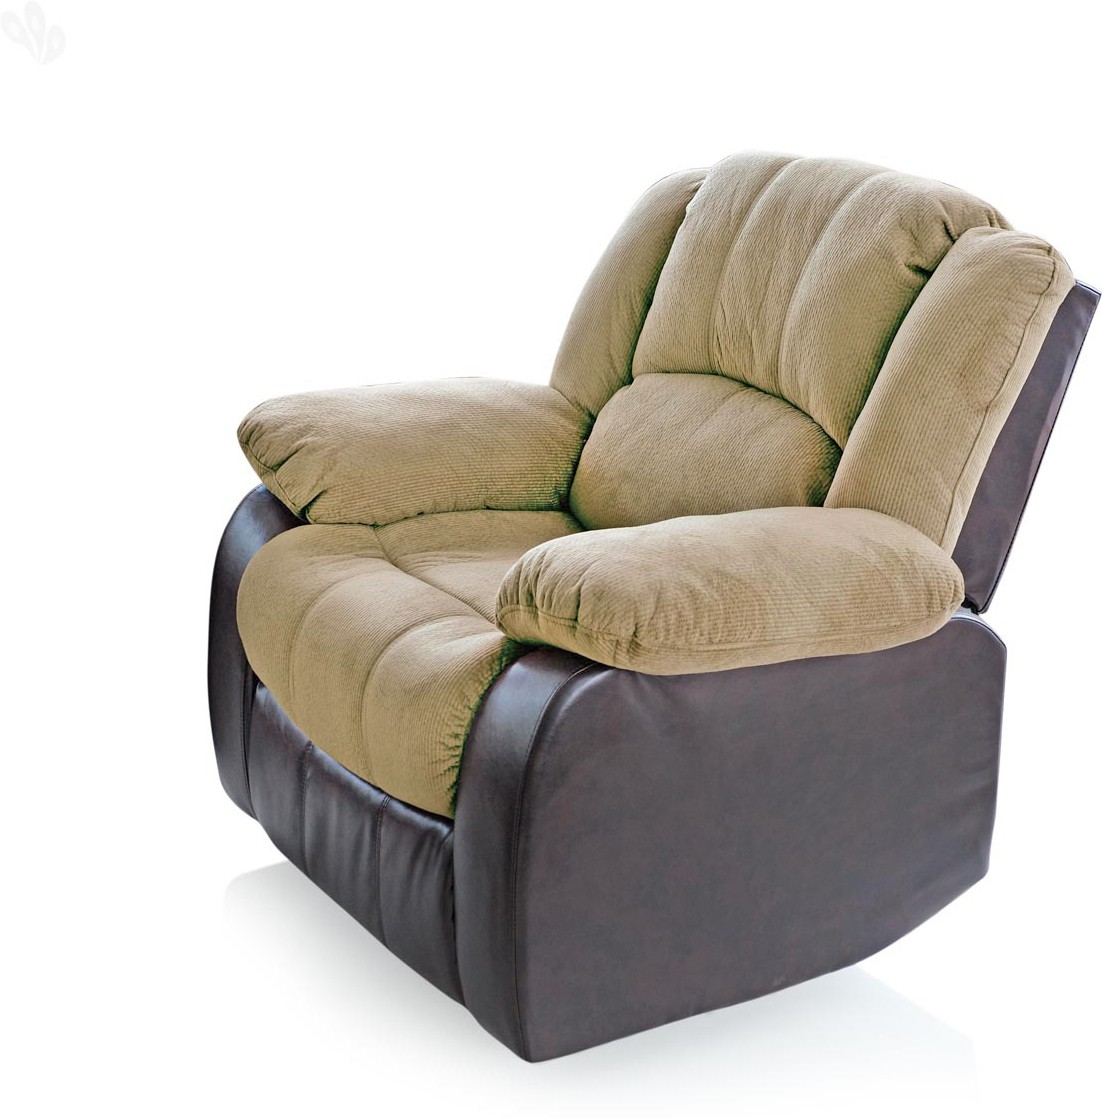 View Royal Oak Engineered Wood 1 Seater Standard(Finish Color - Brown) Furniture (RoyalOak)